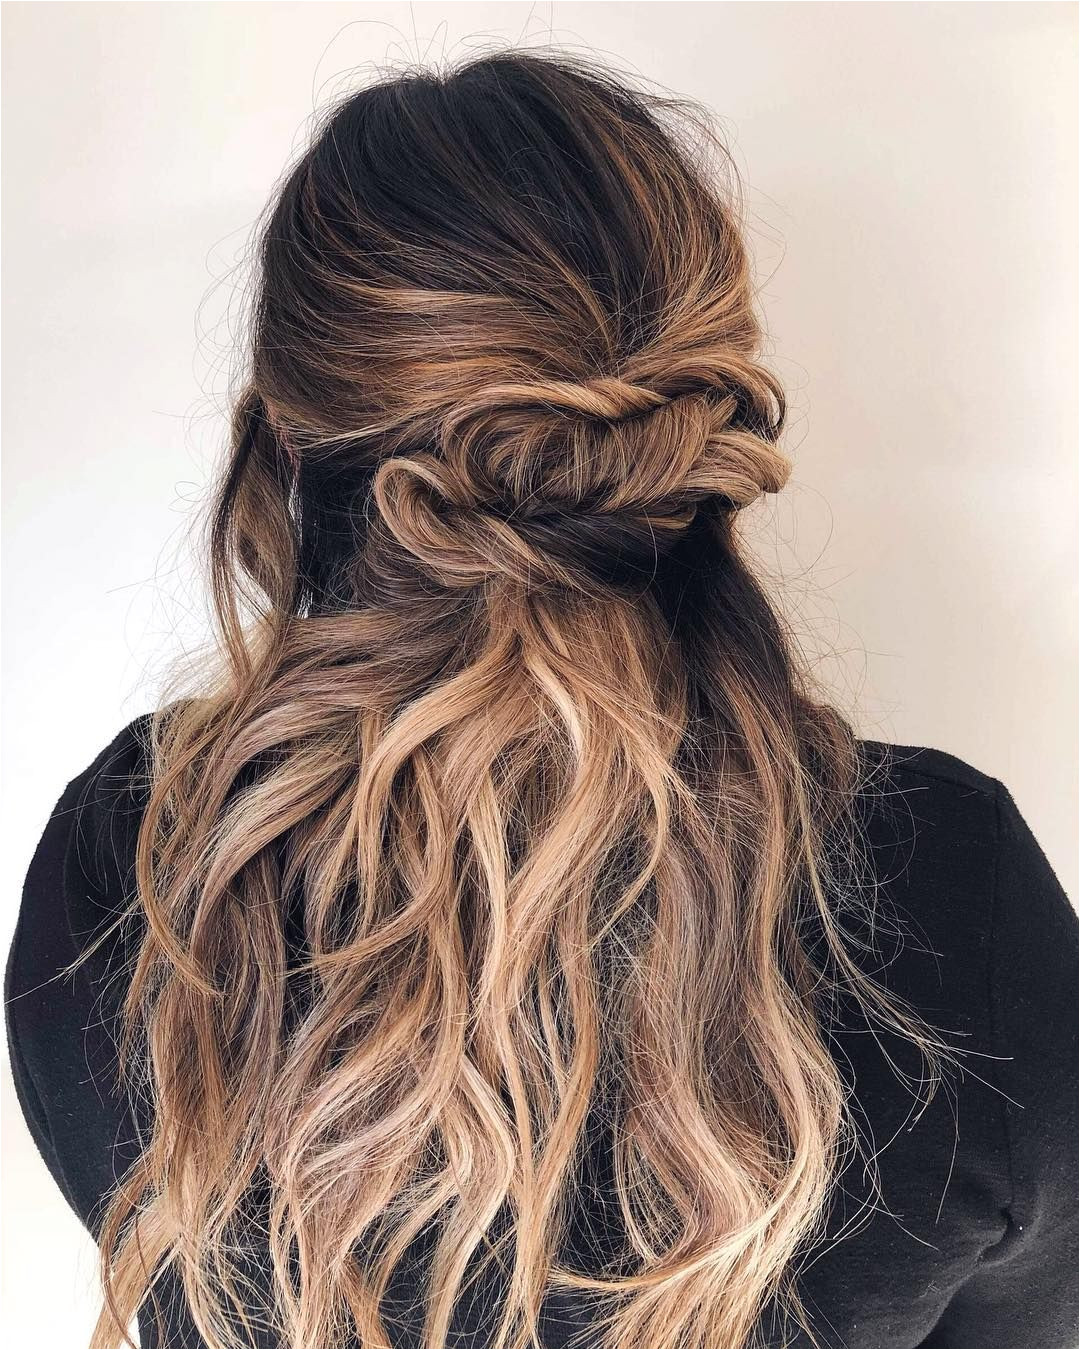 Braids half up half down hairstyle boho hairstyle updo wedding hairstyles hair hairstyles